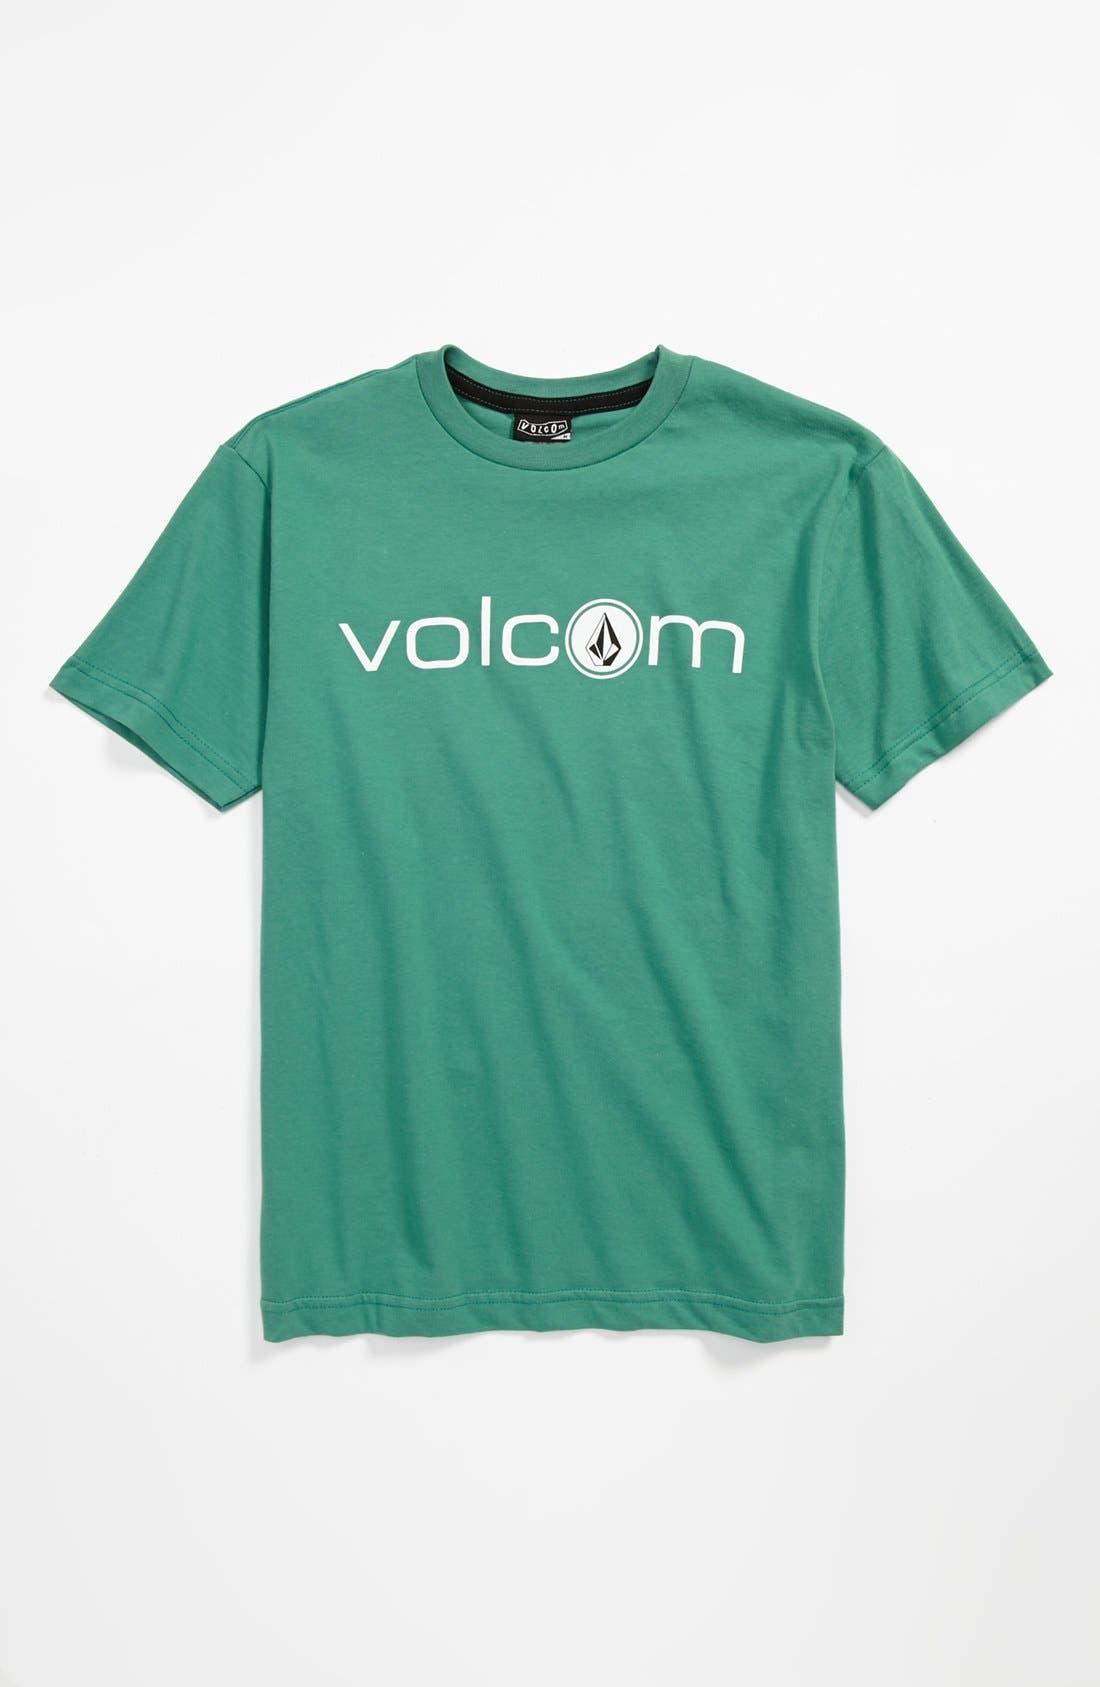 Main Image - Volcom 'Nuero Corpo' T-Shirt (Little Boys & Big Boys)